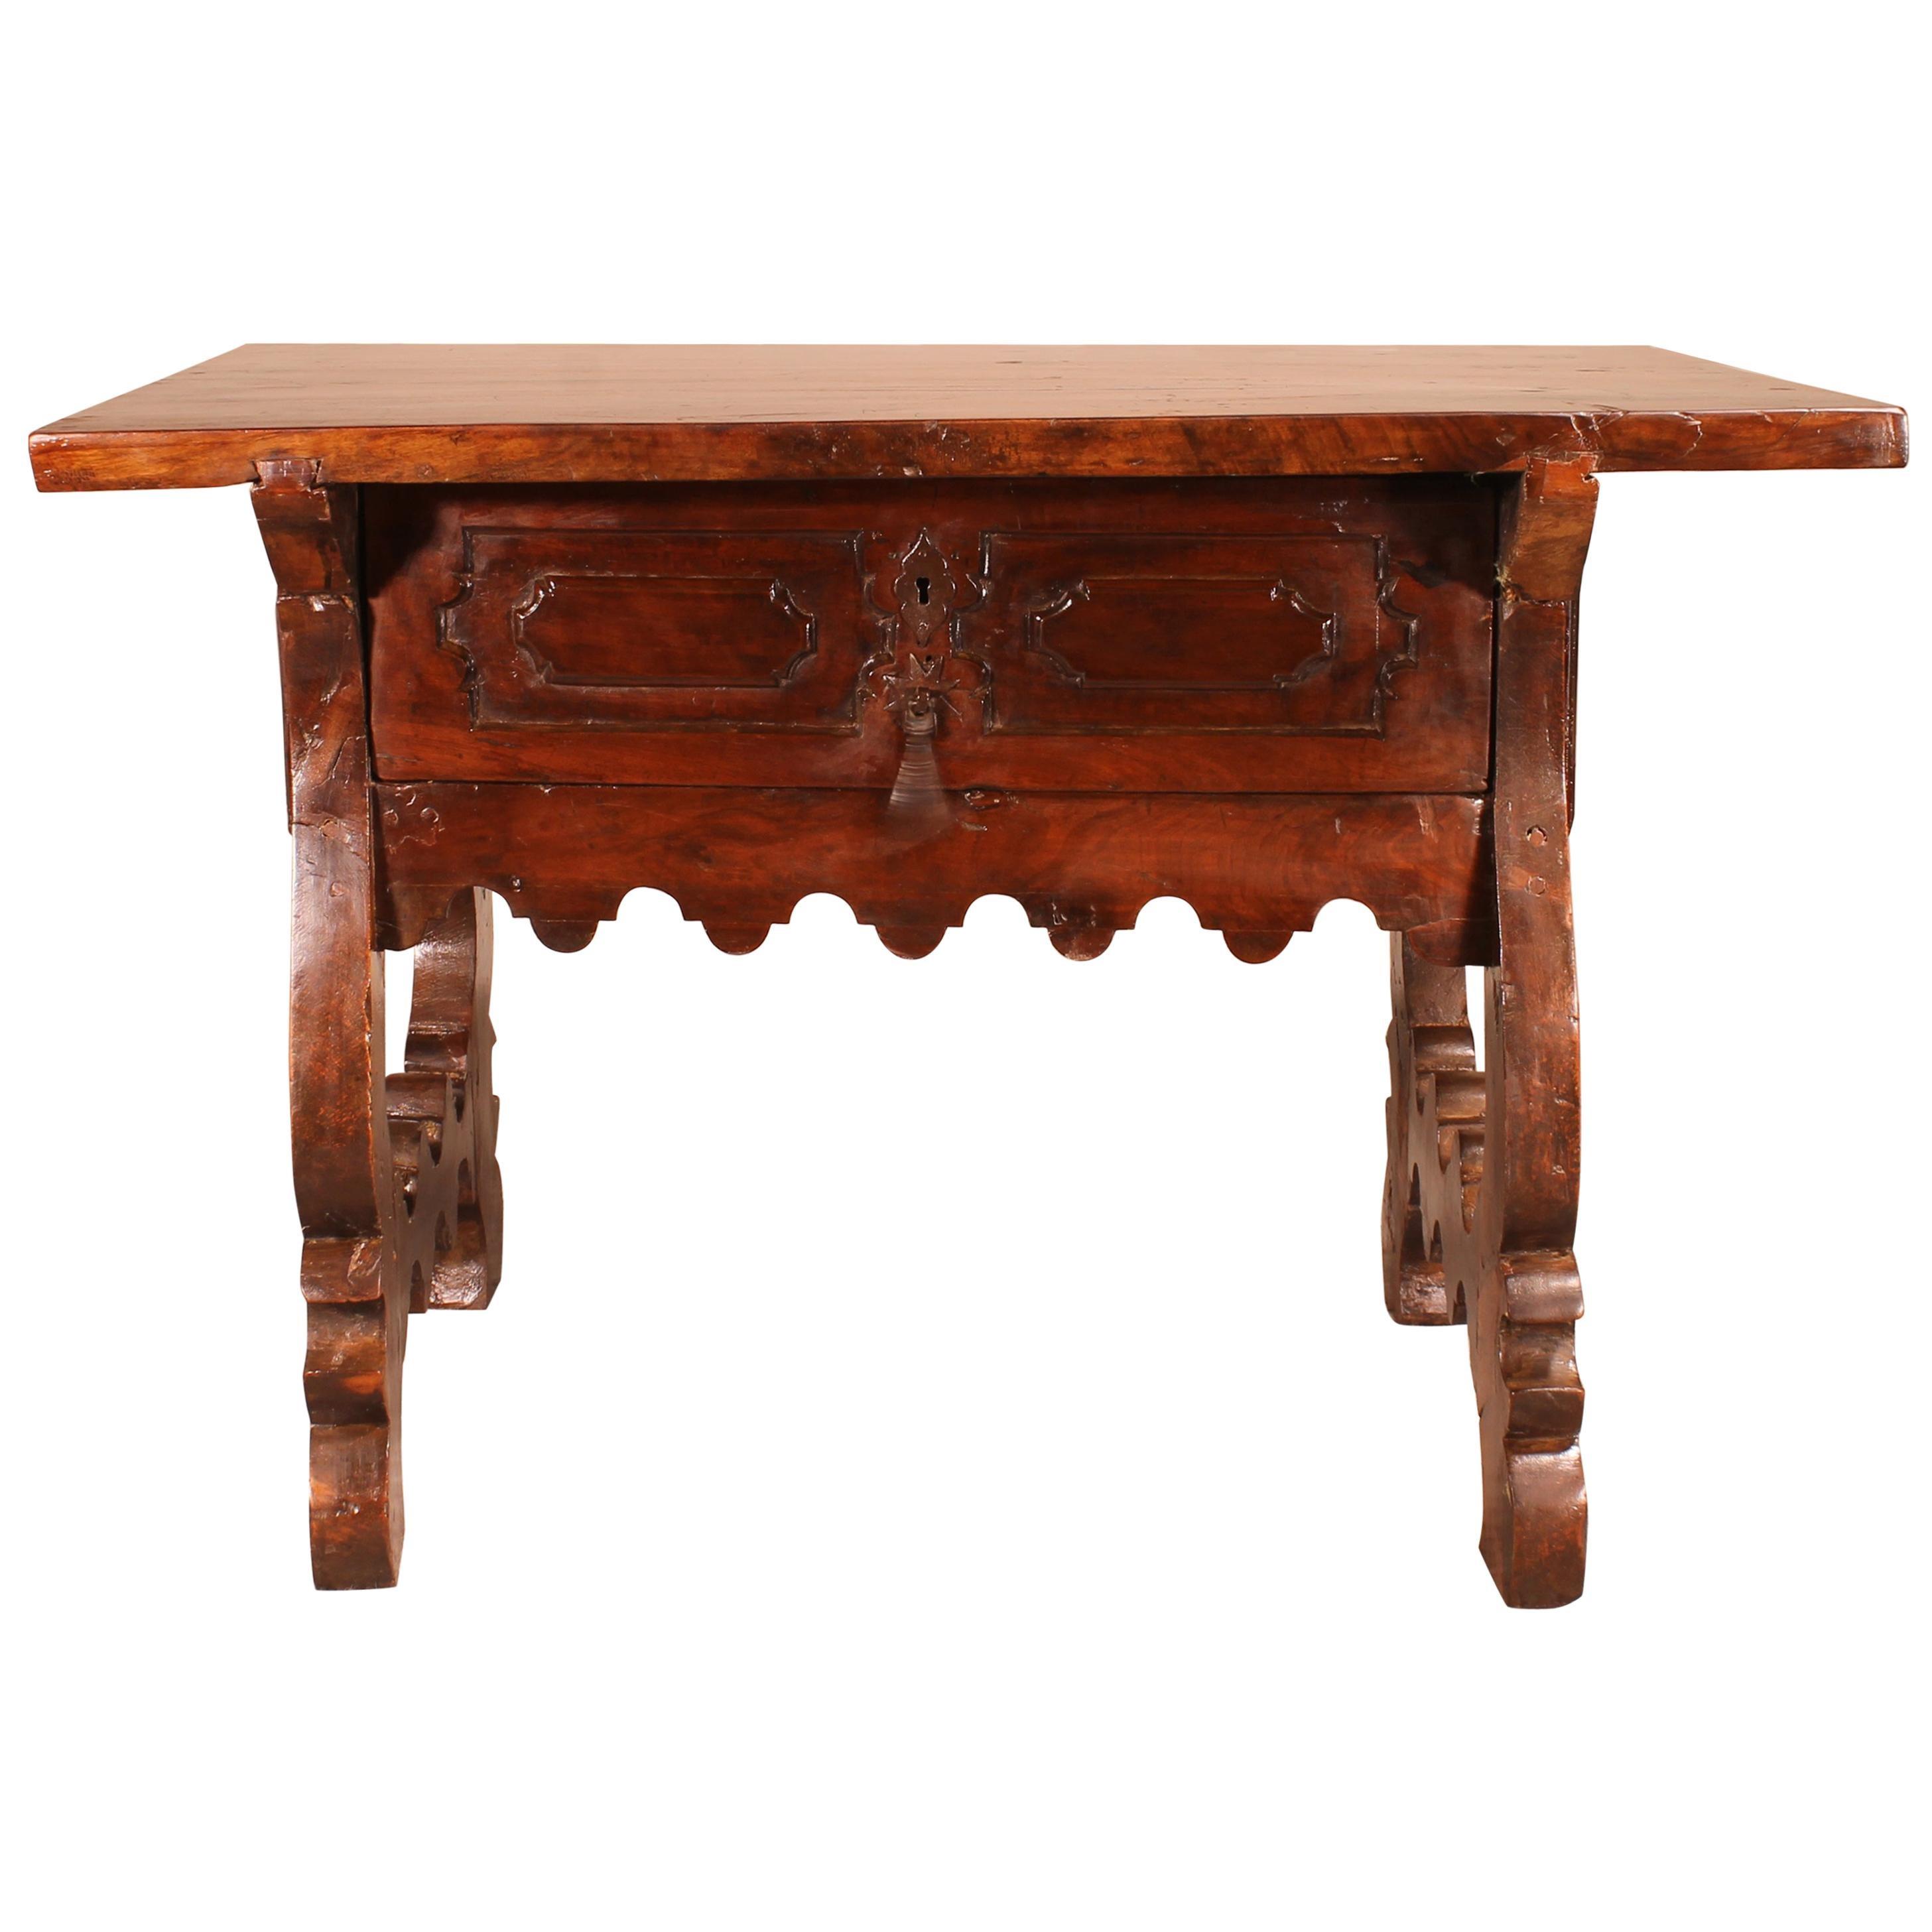 17th Century Spanish Table in Walnut